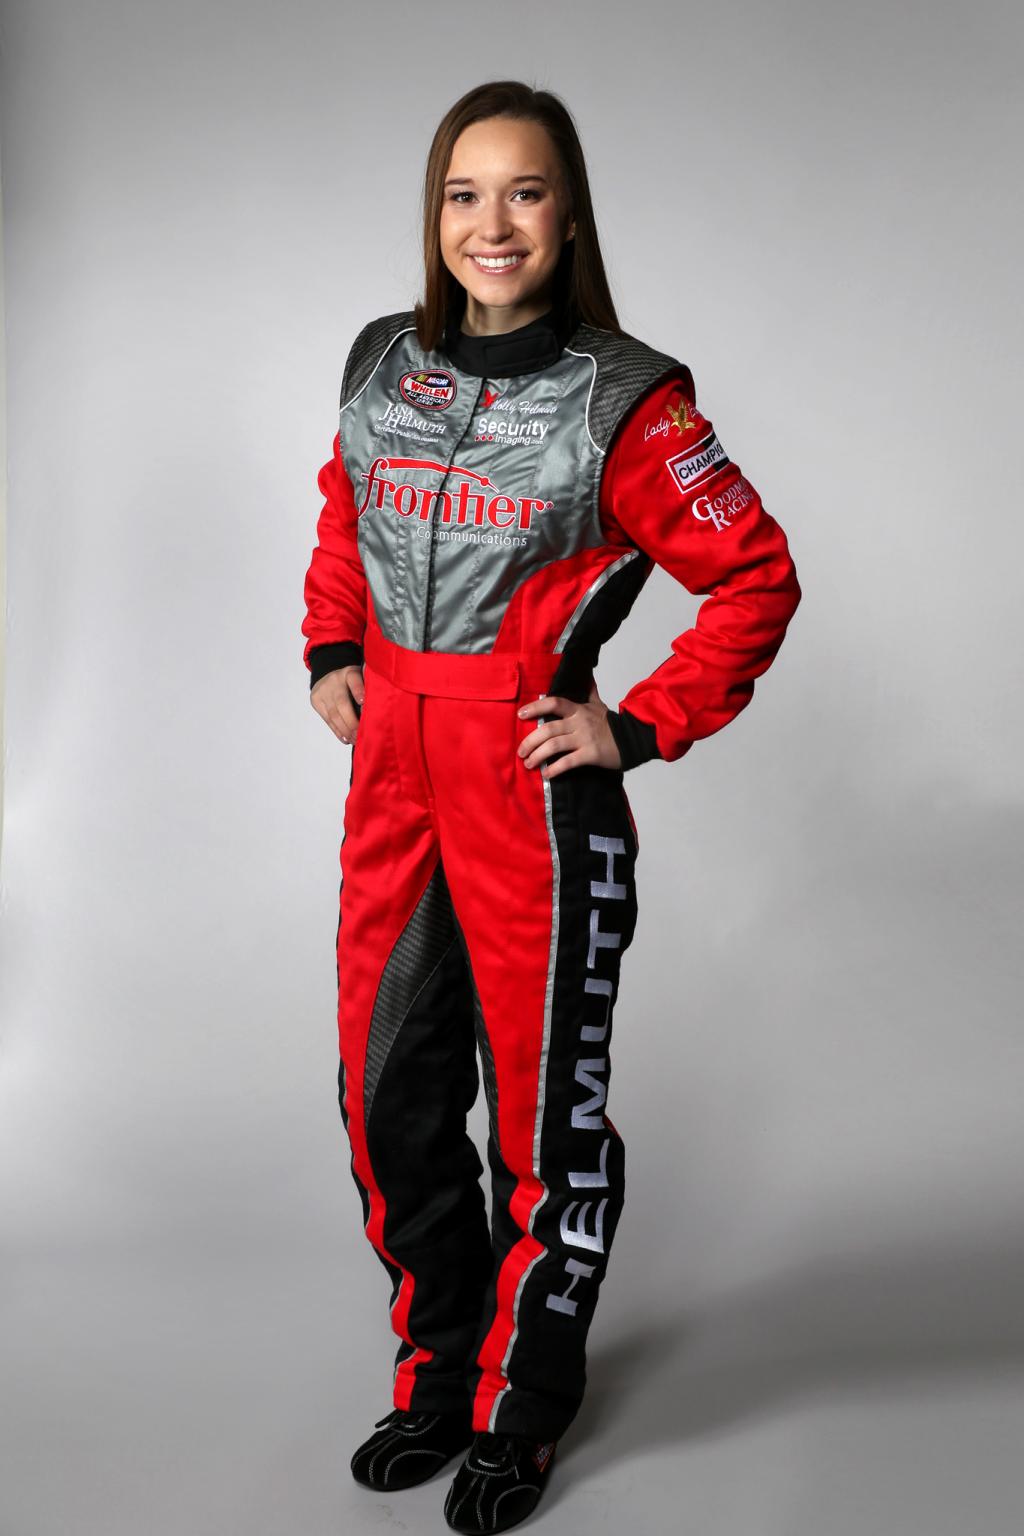 Racecar Driver Molly Helmuth